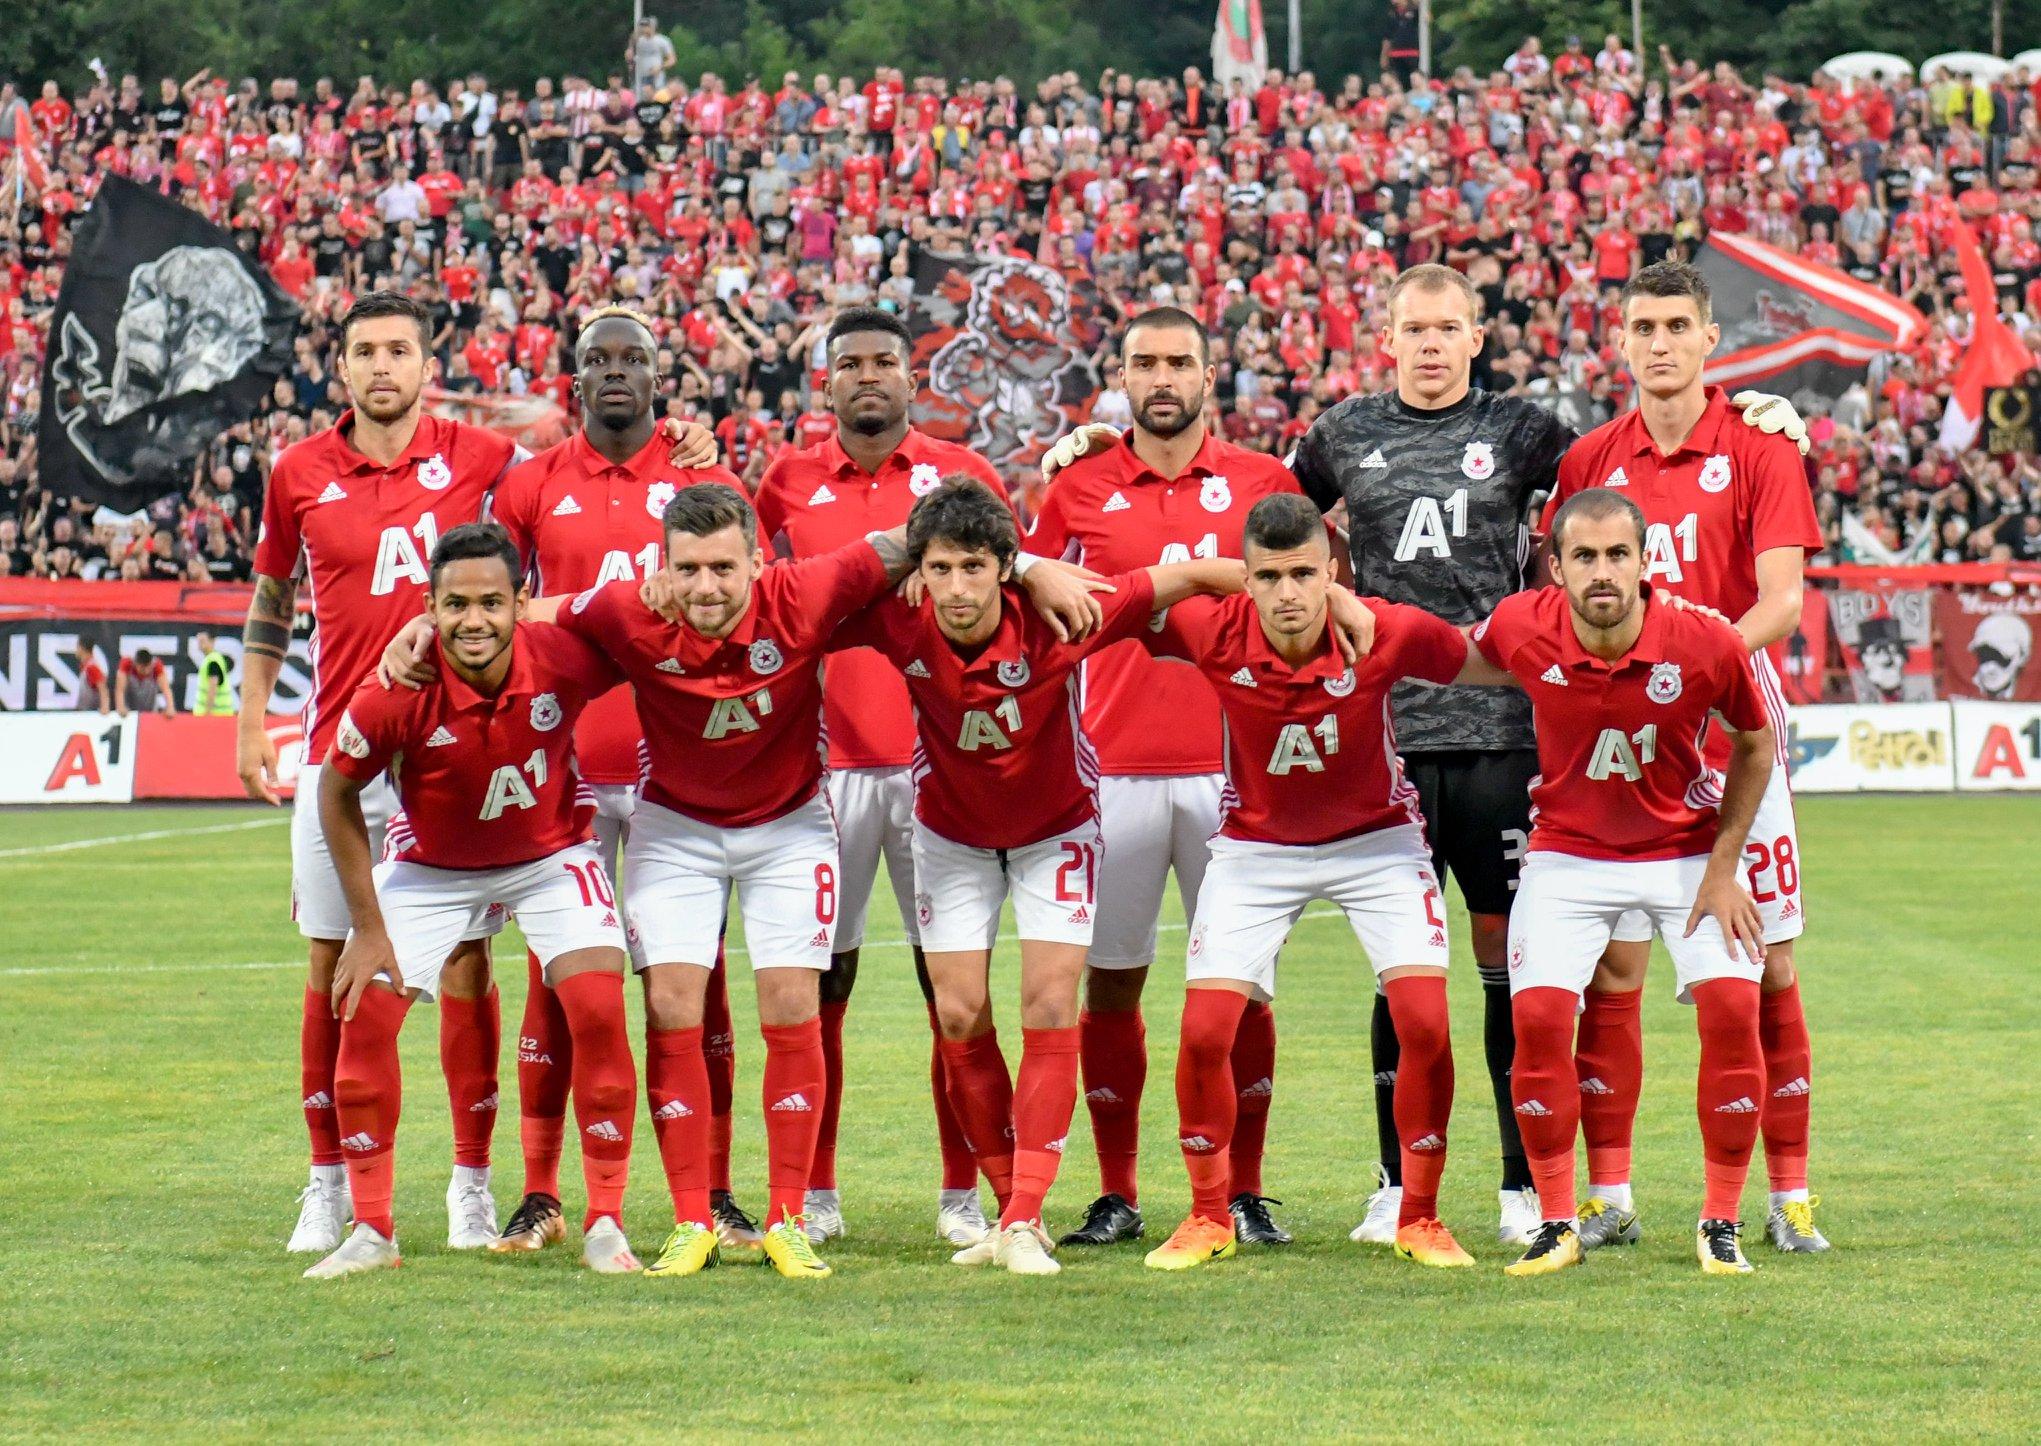 Titograd-CSKA Sofia martedì 16 luglio: pronostico Europa League